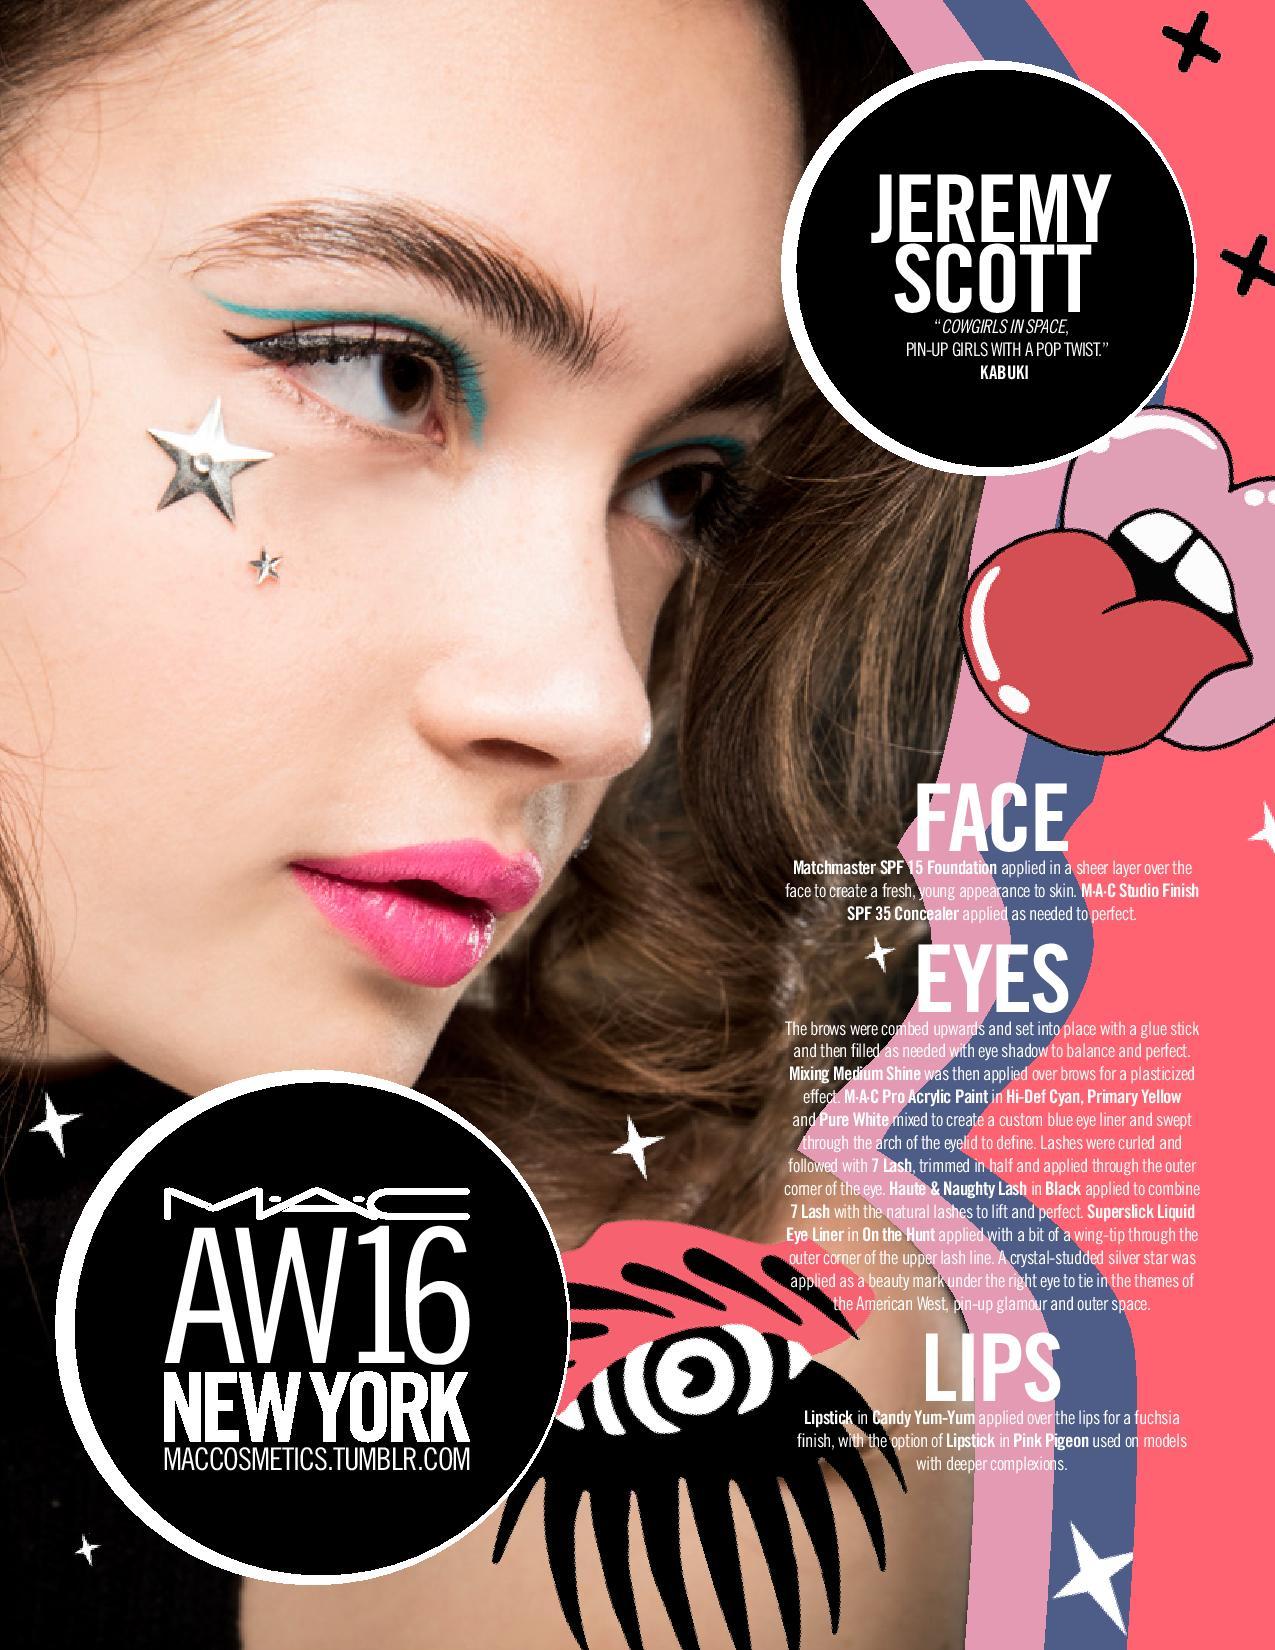 AW16_DAILY FACECHART_NEW YORK_FEB 15 Carolina Herrera, Jeremy Scott, Rag...-page-003